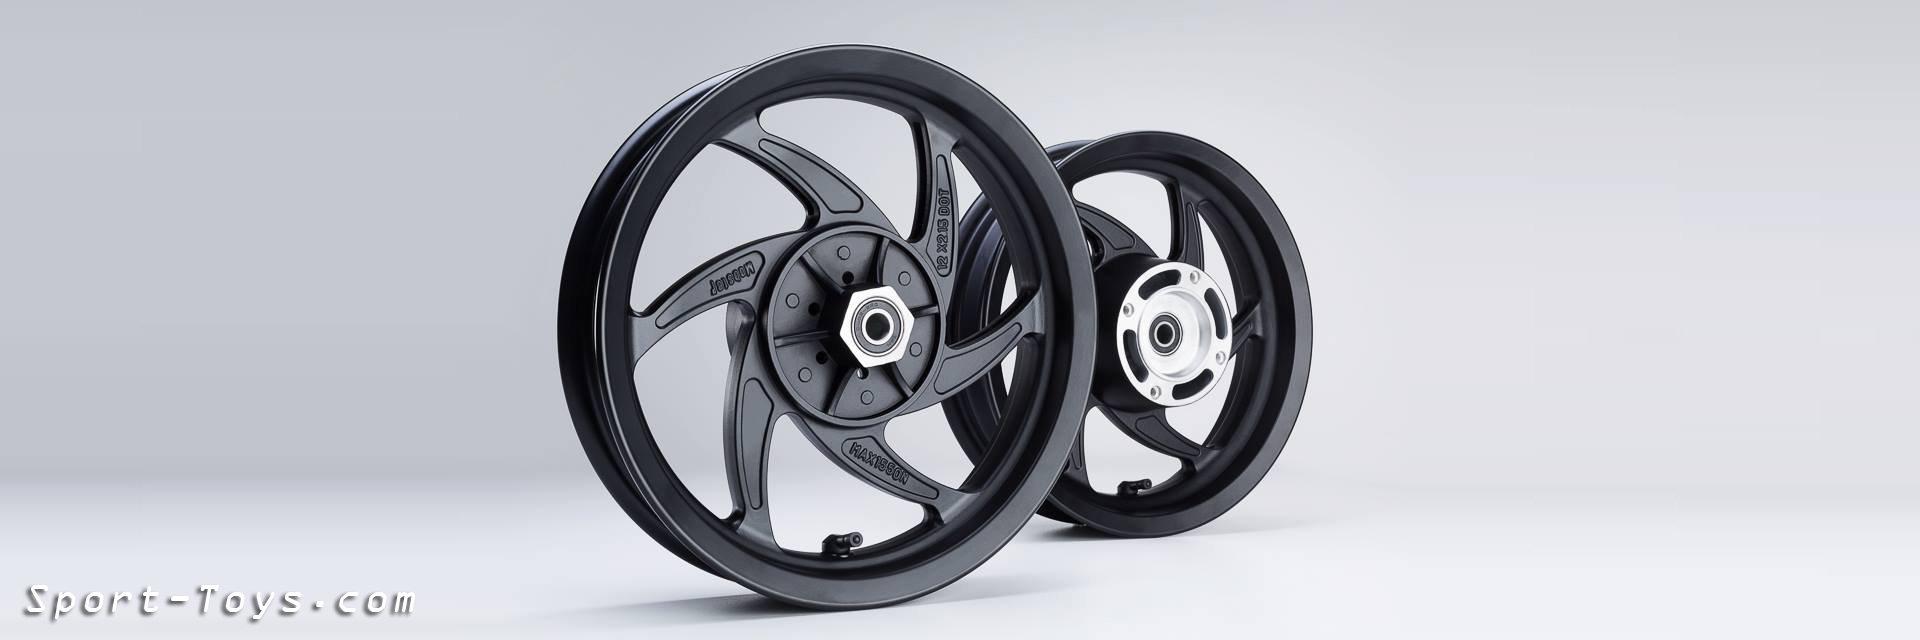 12 Tubeless Rims For Pit Bike Minigp Scooter Mini Motard